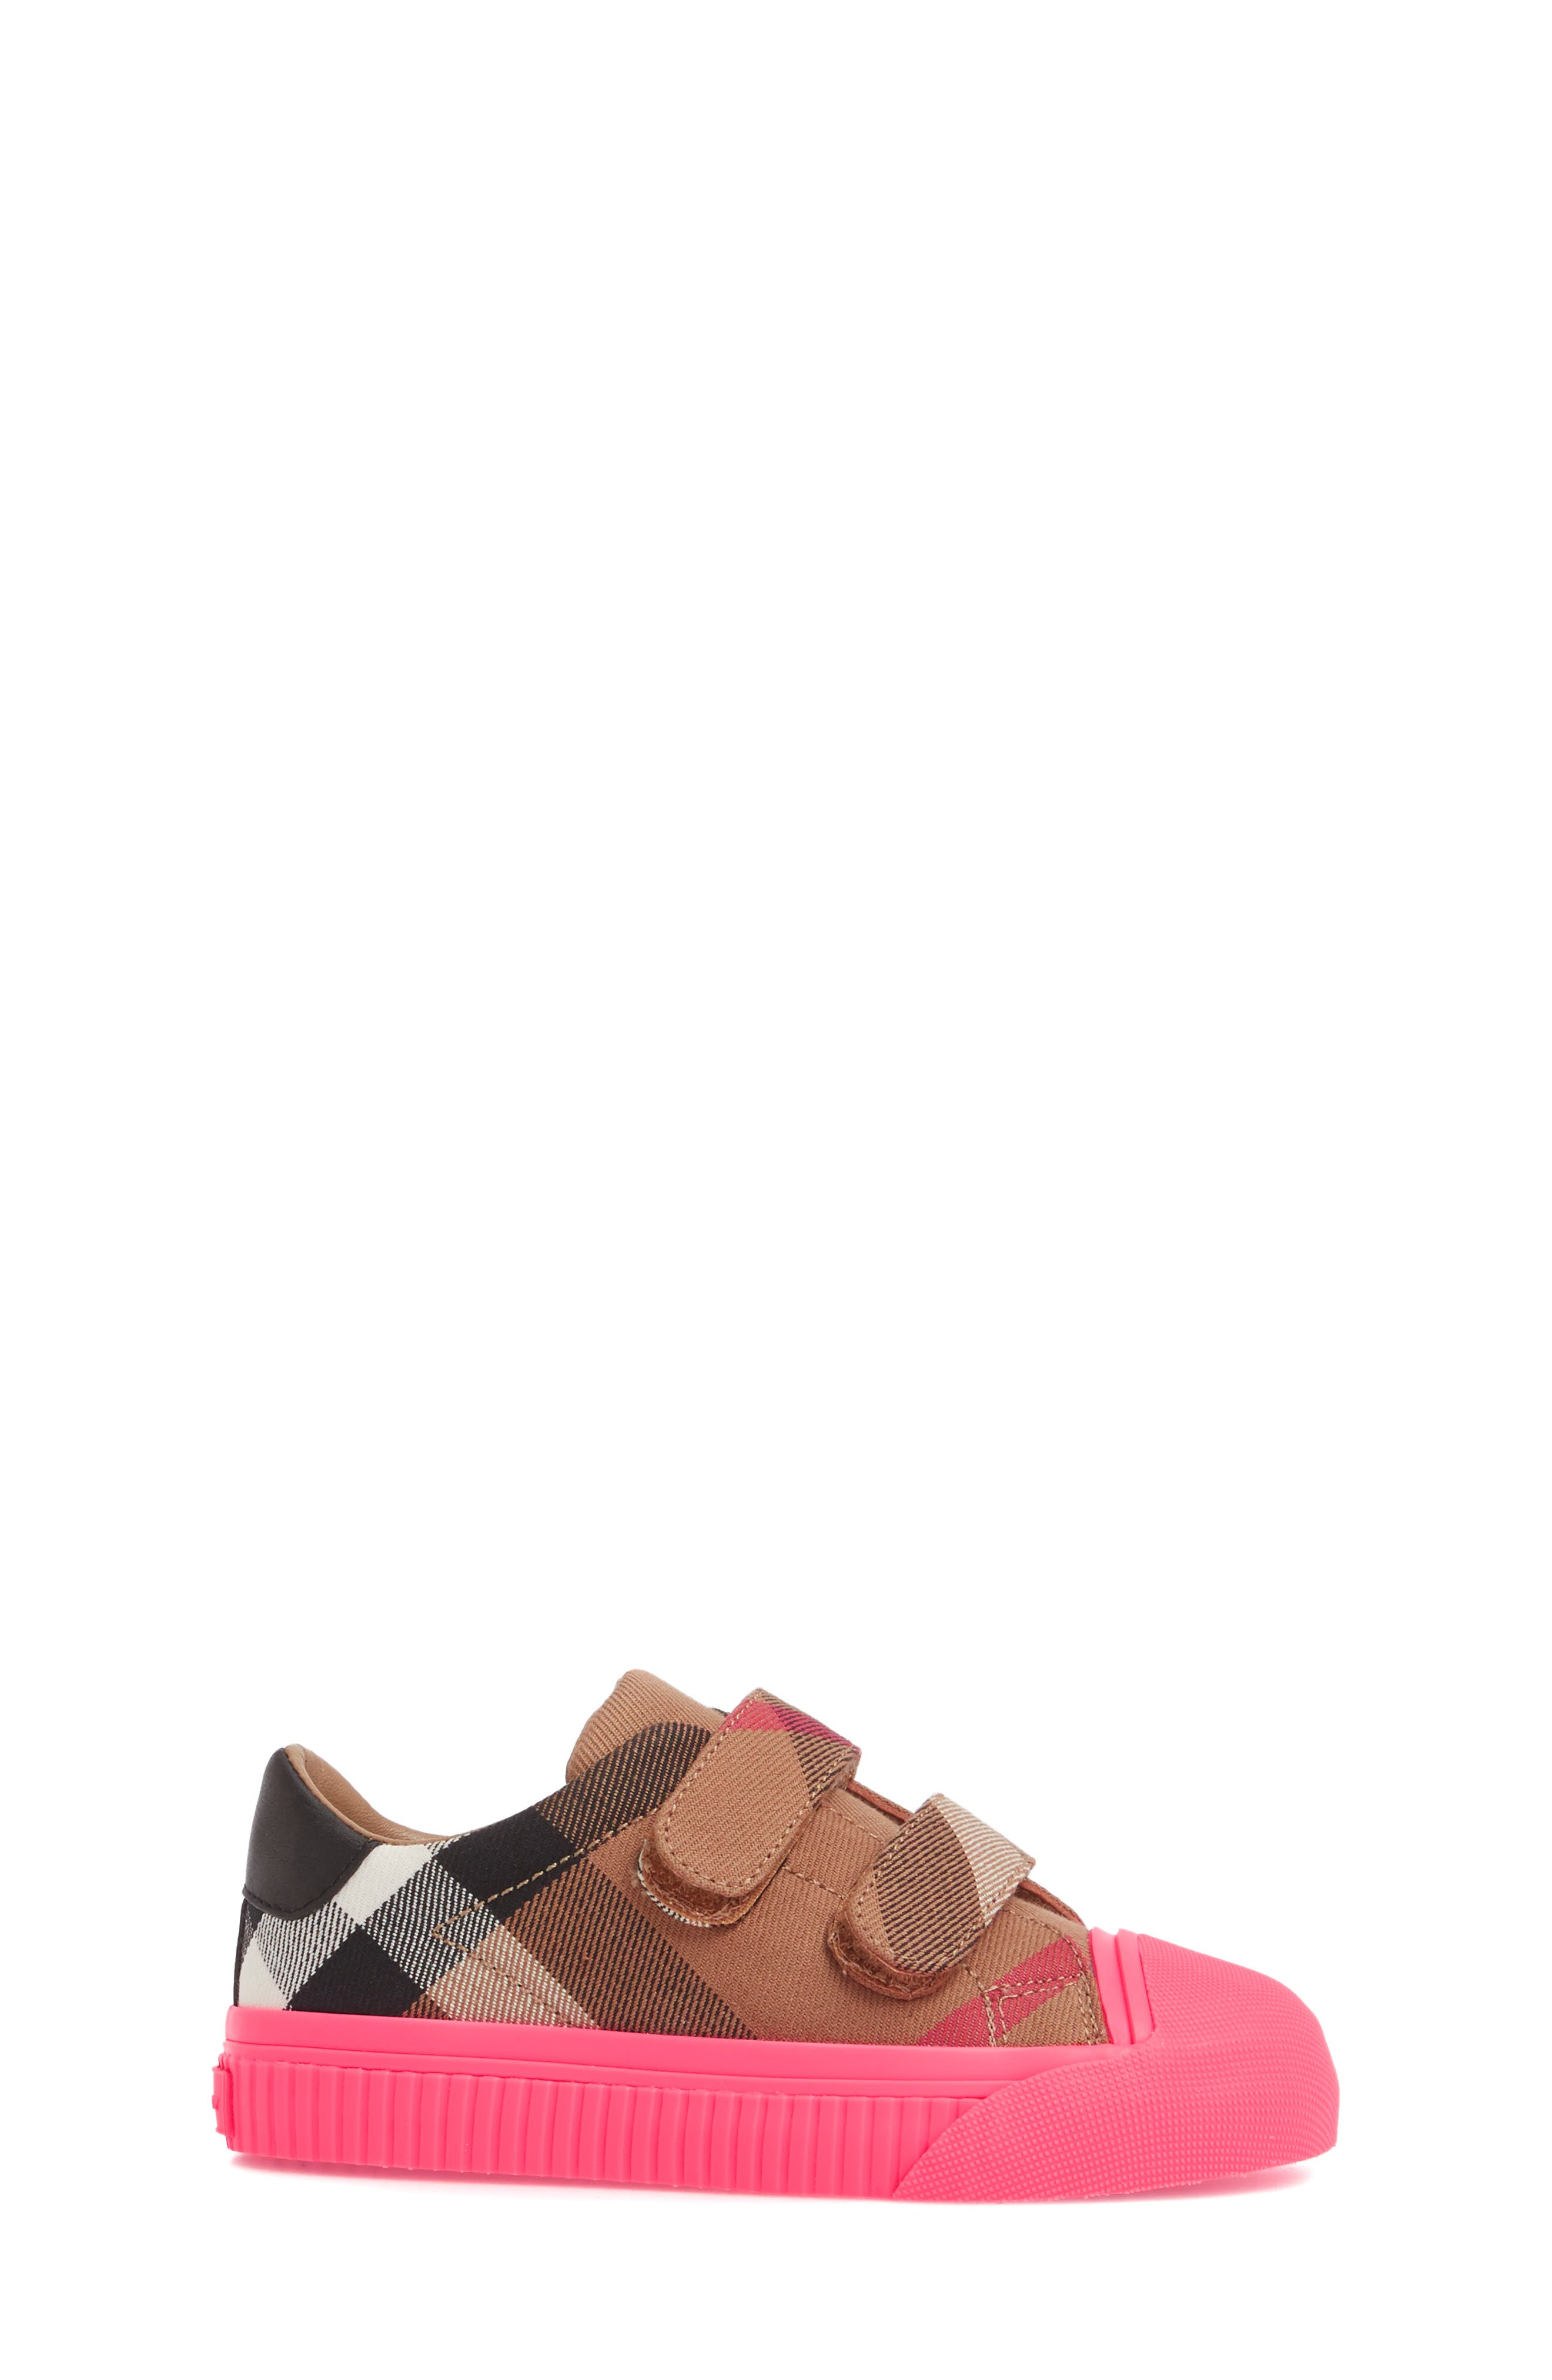 Belside Sneaker,                             Alternate thumbnail 3, color,                             Classic/ Neon Pink